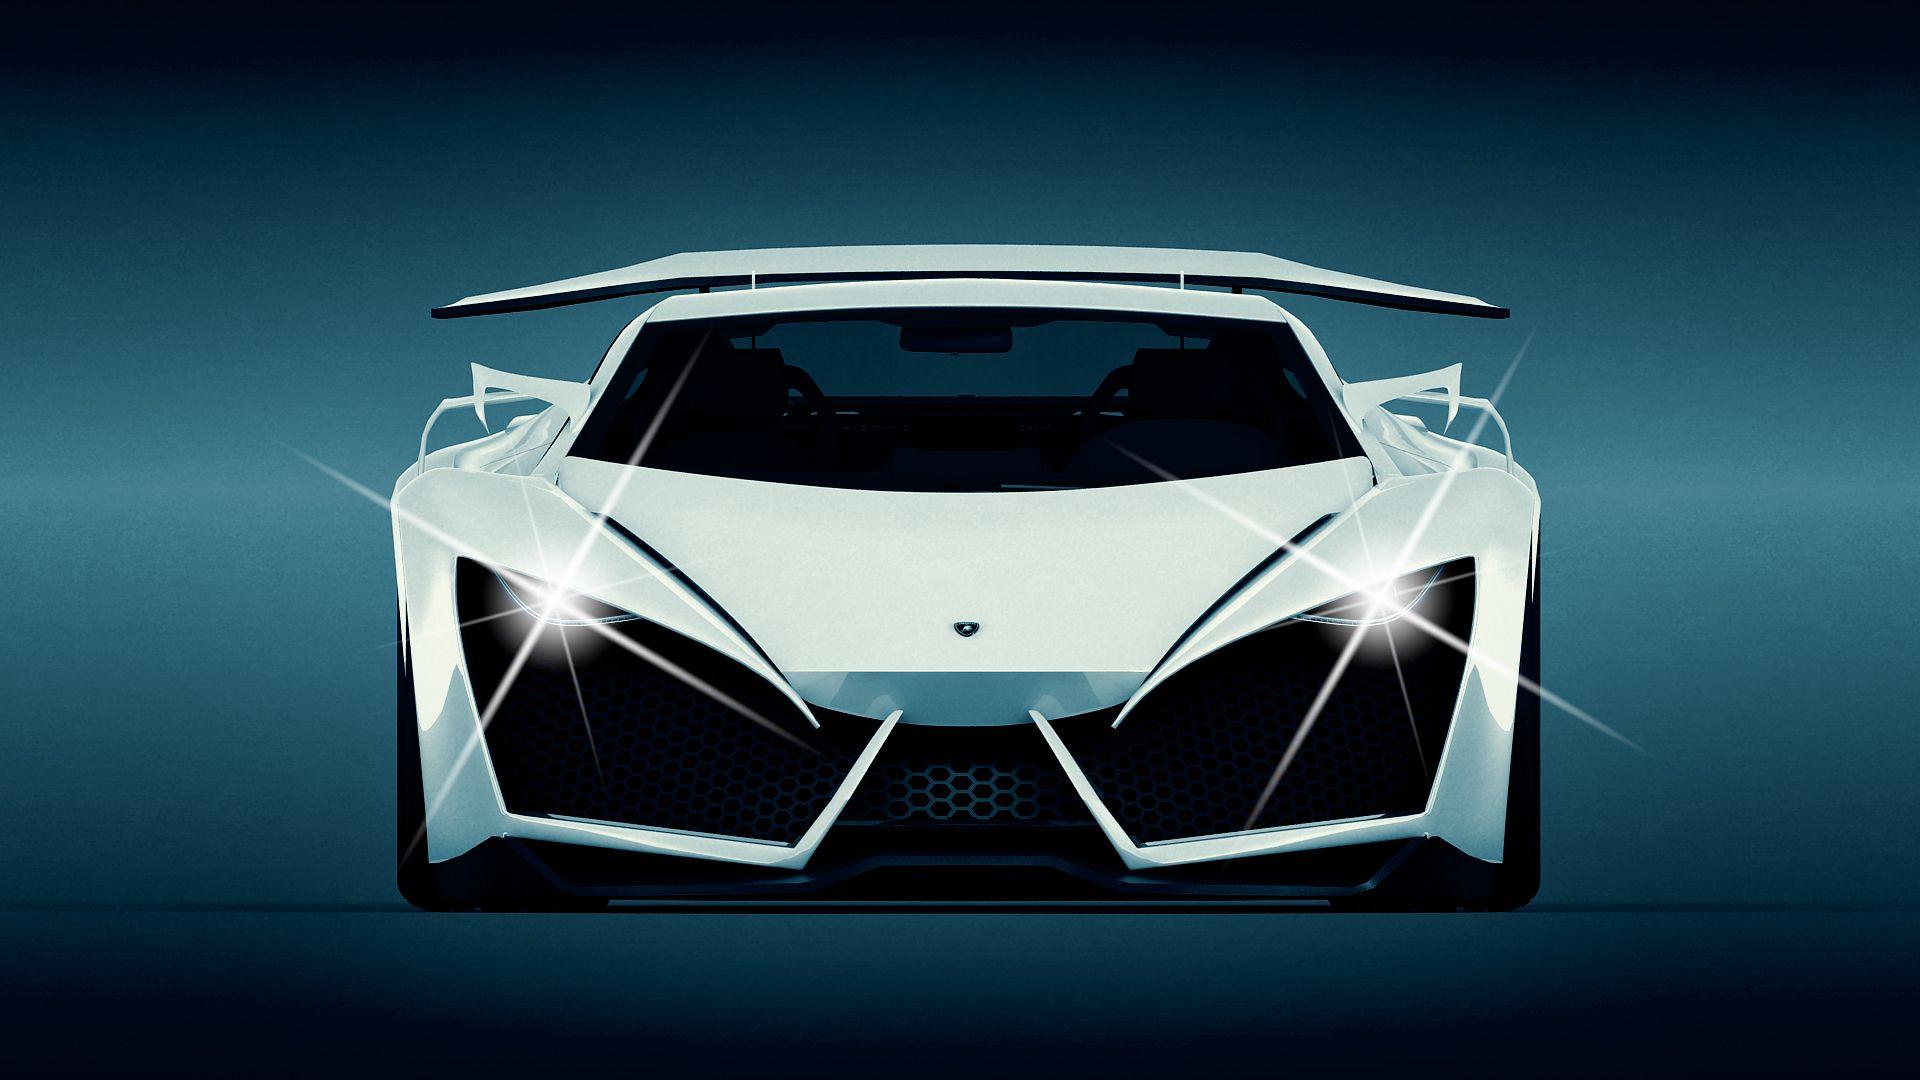 Good Lamborghini Sinistro By Maher Thebian At Coroflot. Awesome Design